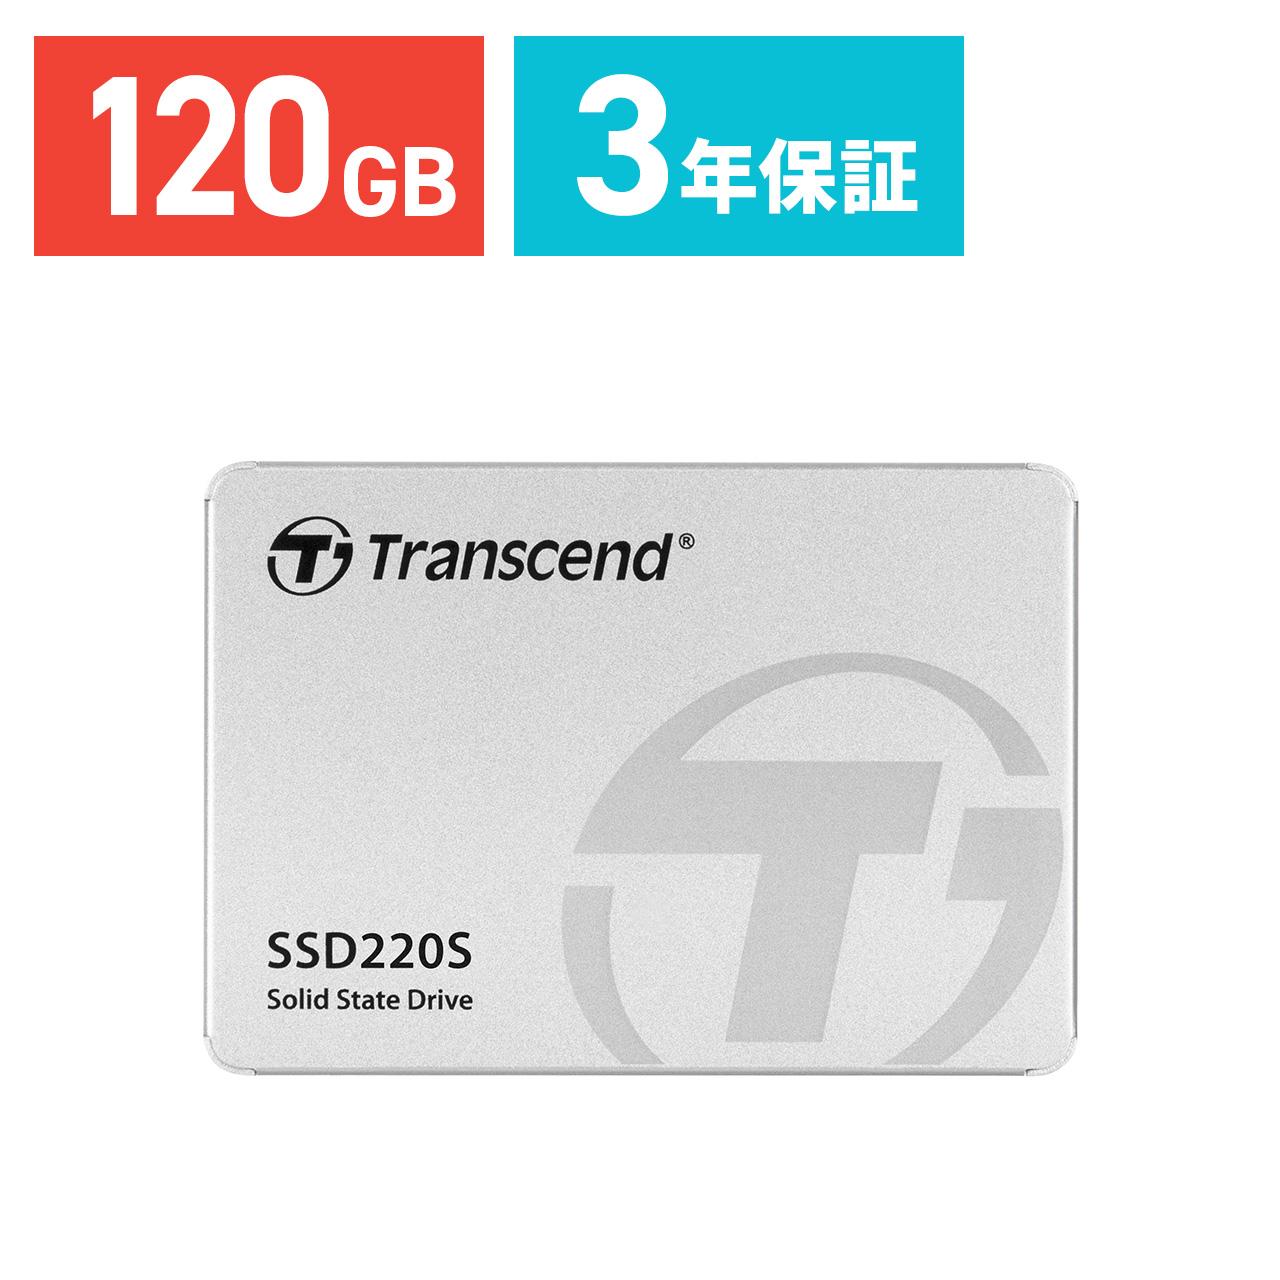 [TS120GSSD220S]【送料無料】 Transcend SSD 2.5インチ 120GB SATA-III対応 6Gb/s